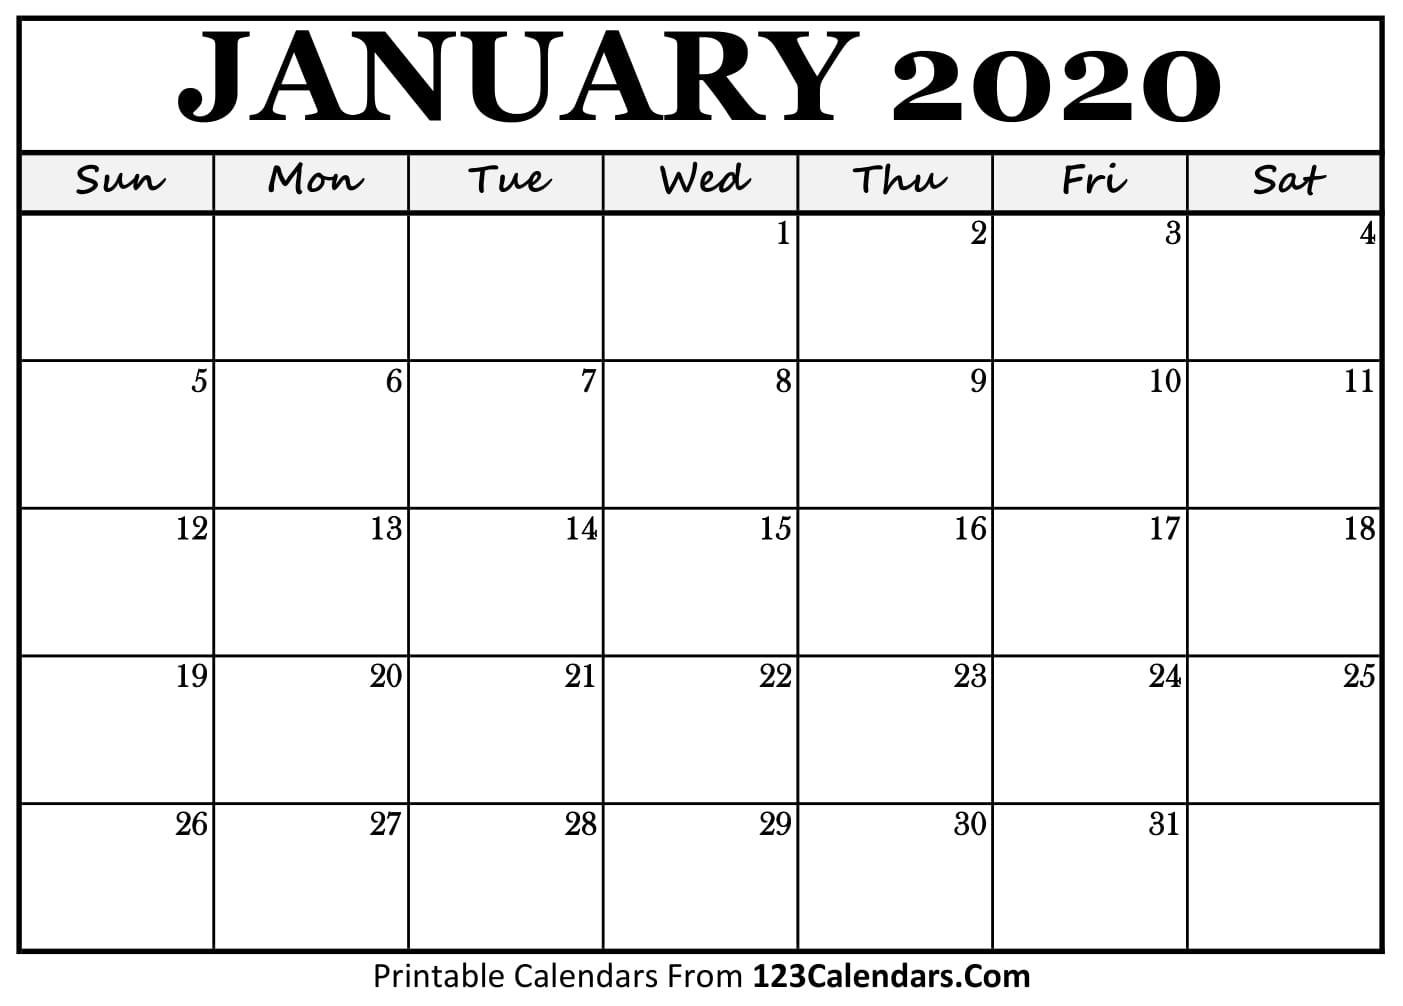 Free Printable Calendar | 123Calendars  2020 Calendar Free Printable